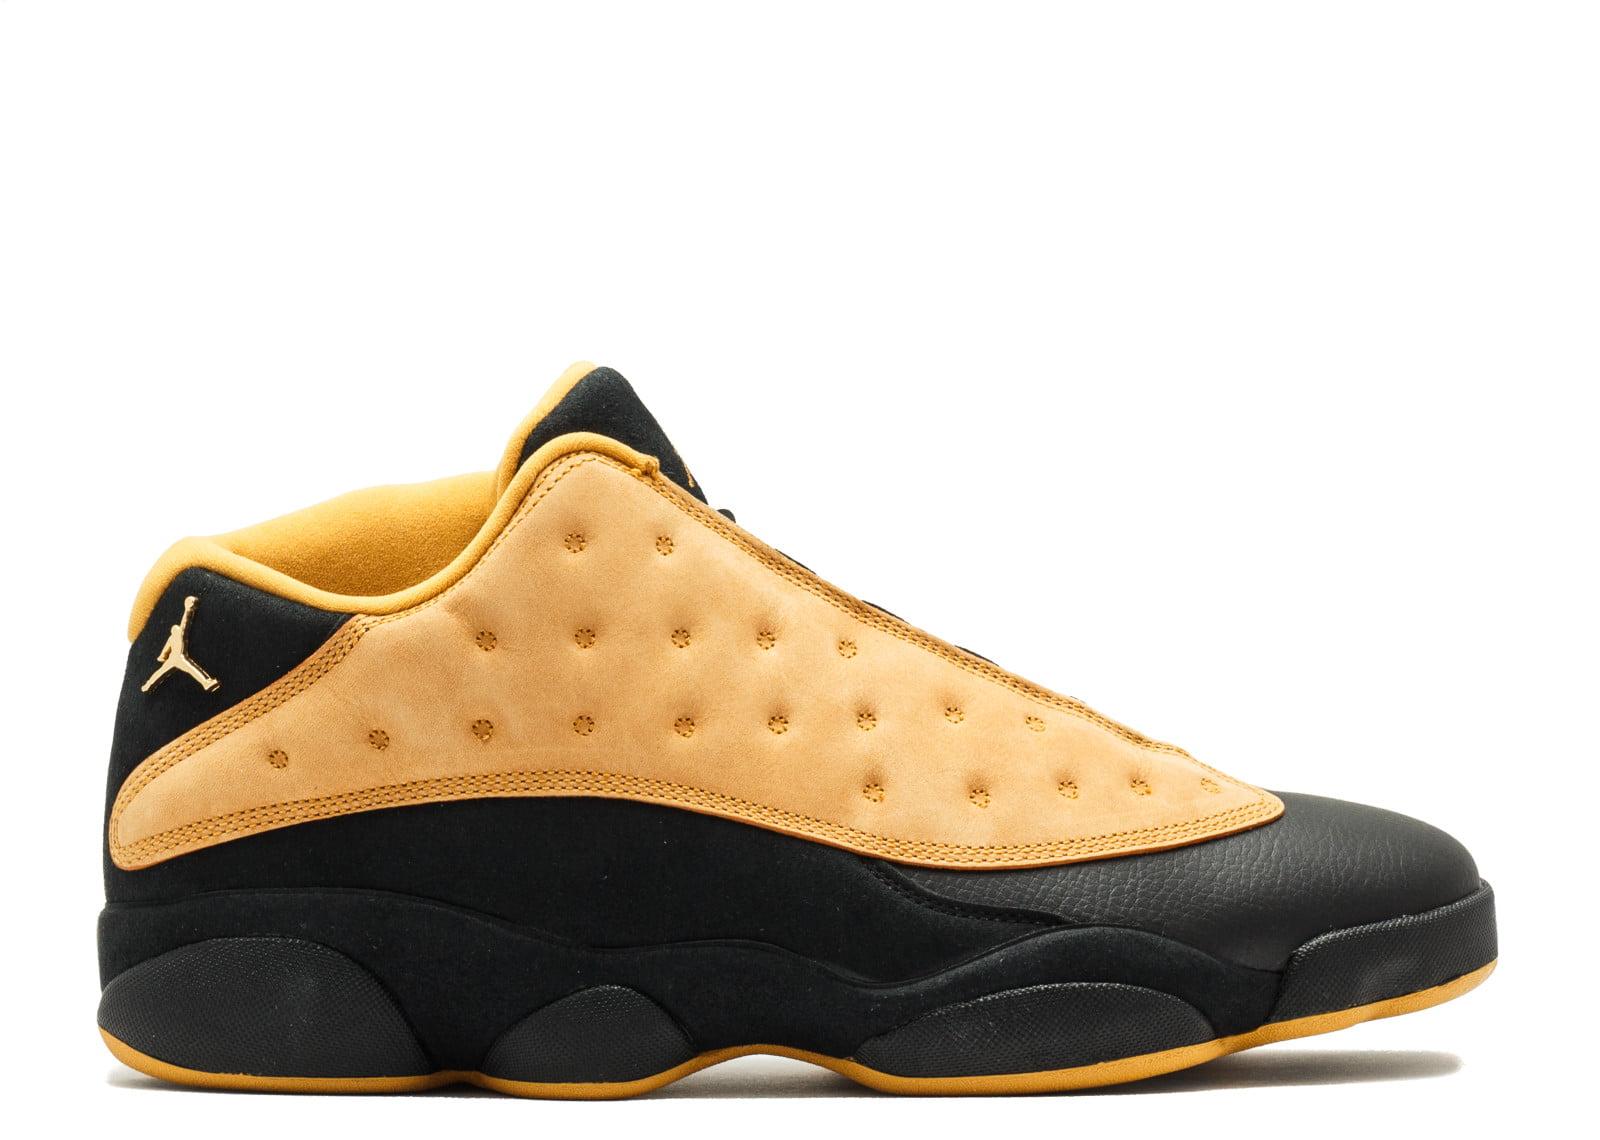 Air Jordan 13 Retro Low 'Chutney